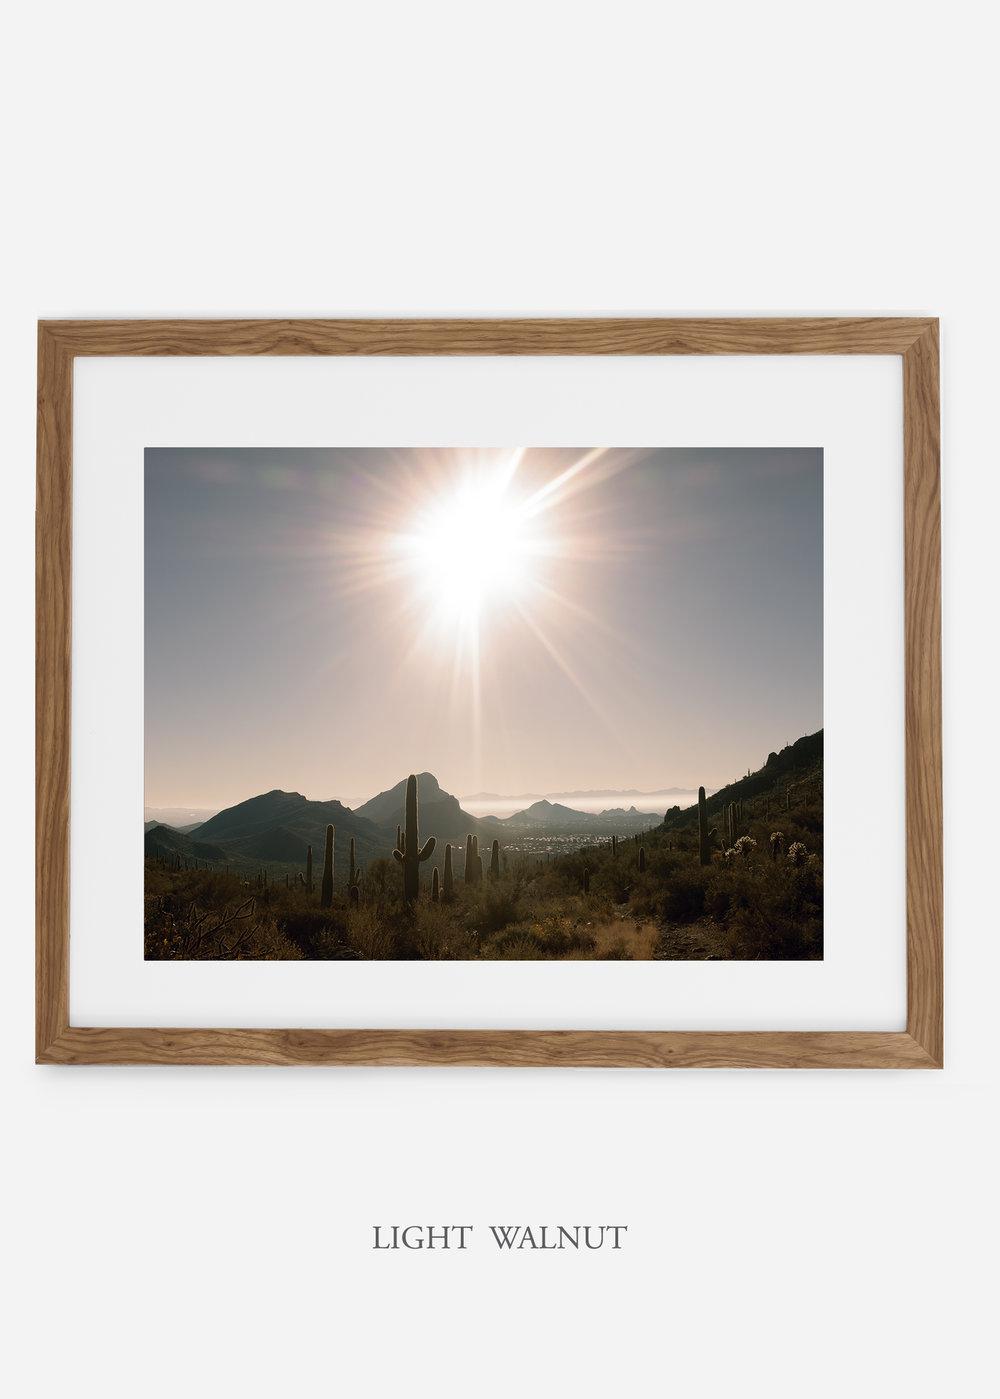 lightwalnutframe-saguaroNo.15-wildercalifornia-art-wallart-cactusprint-homedecor-prints-arizona-botanical-artwork-interiordesign.jpg